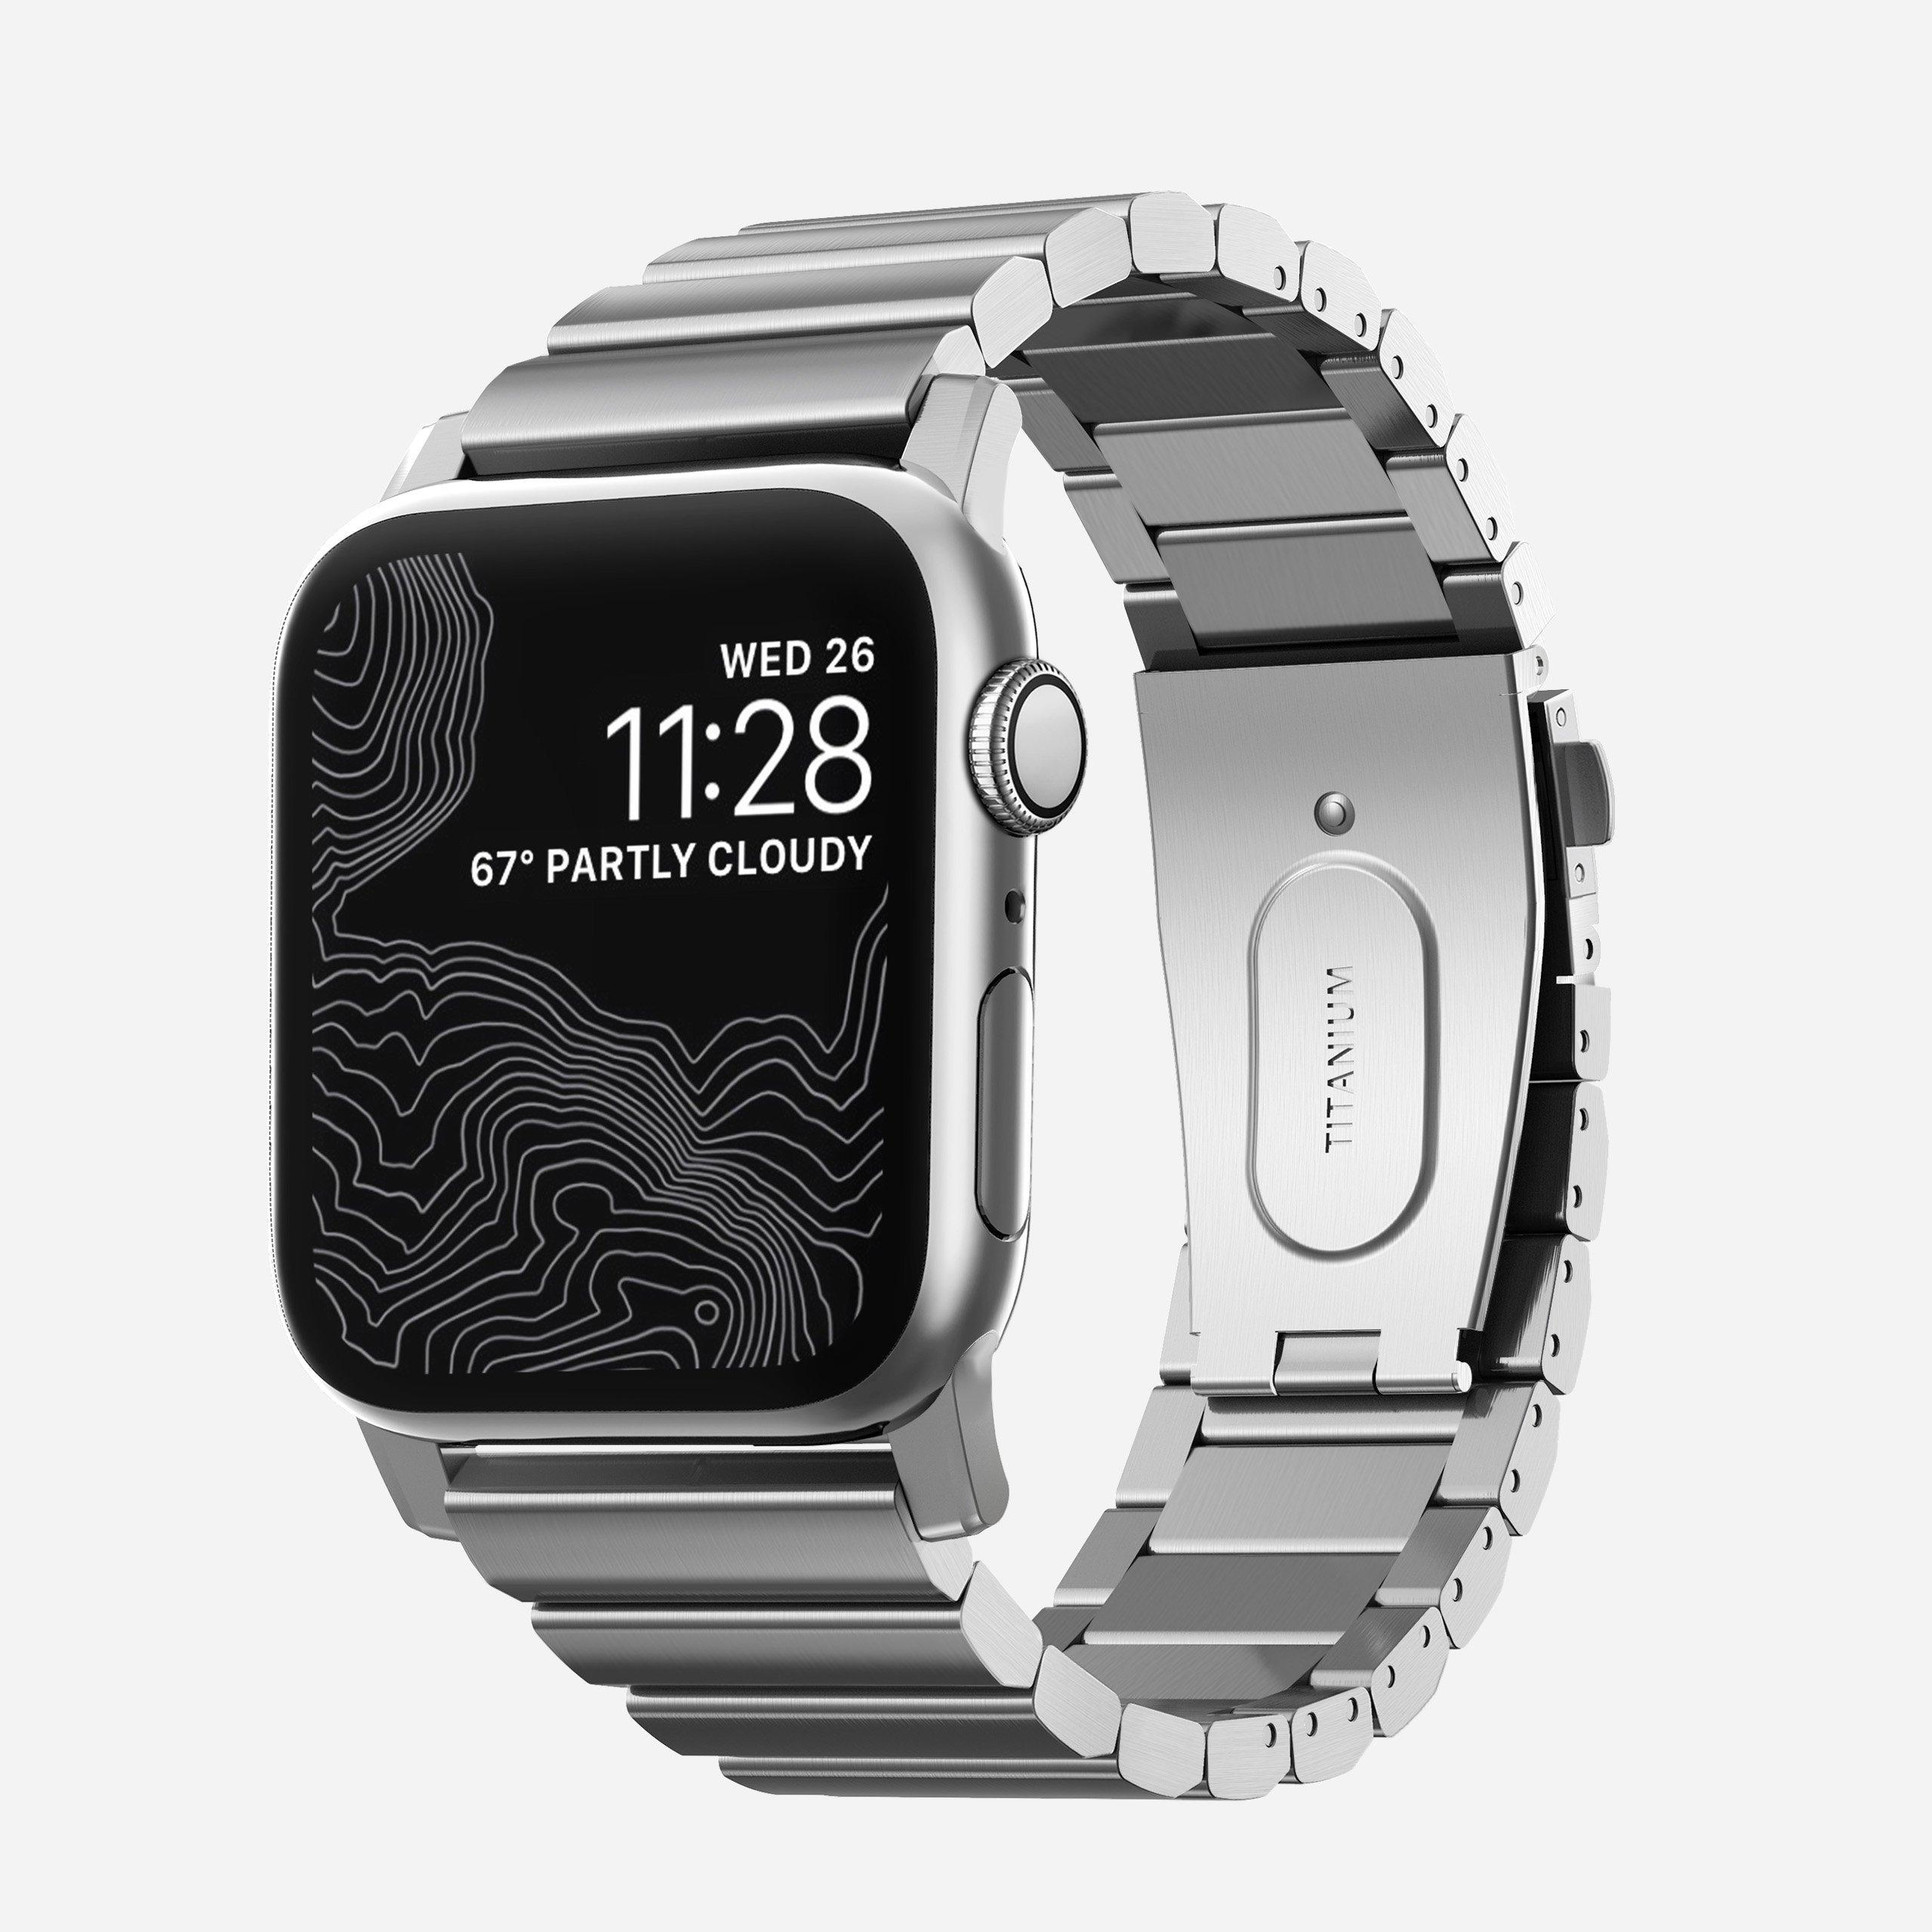 Apple Watch Titanium Band, Silver Hardware